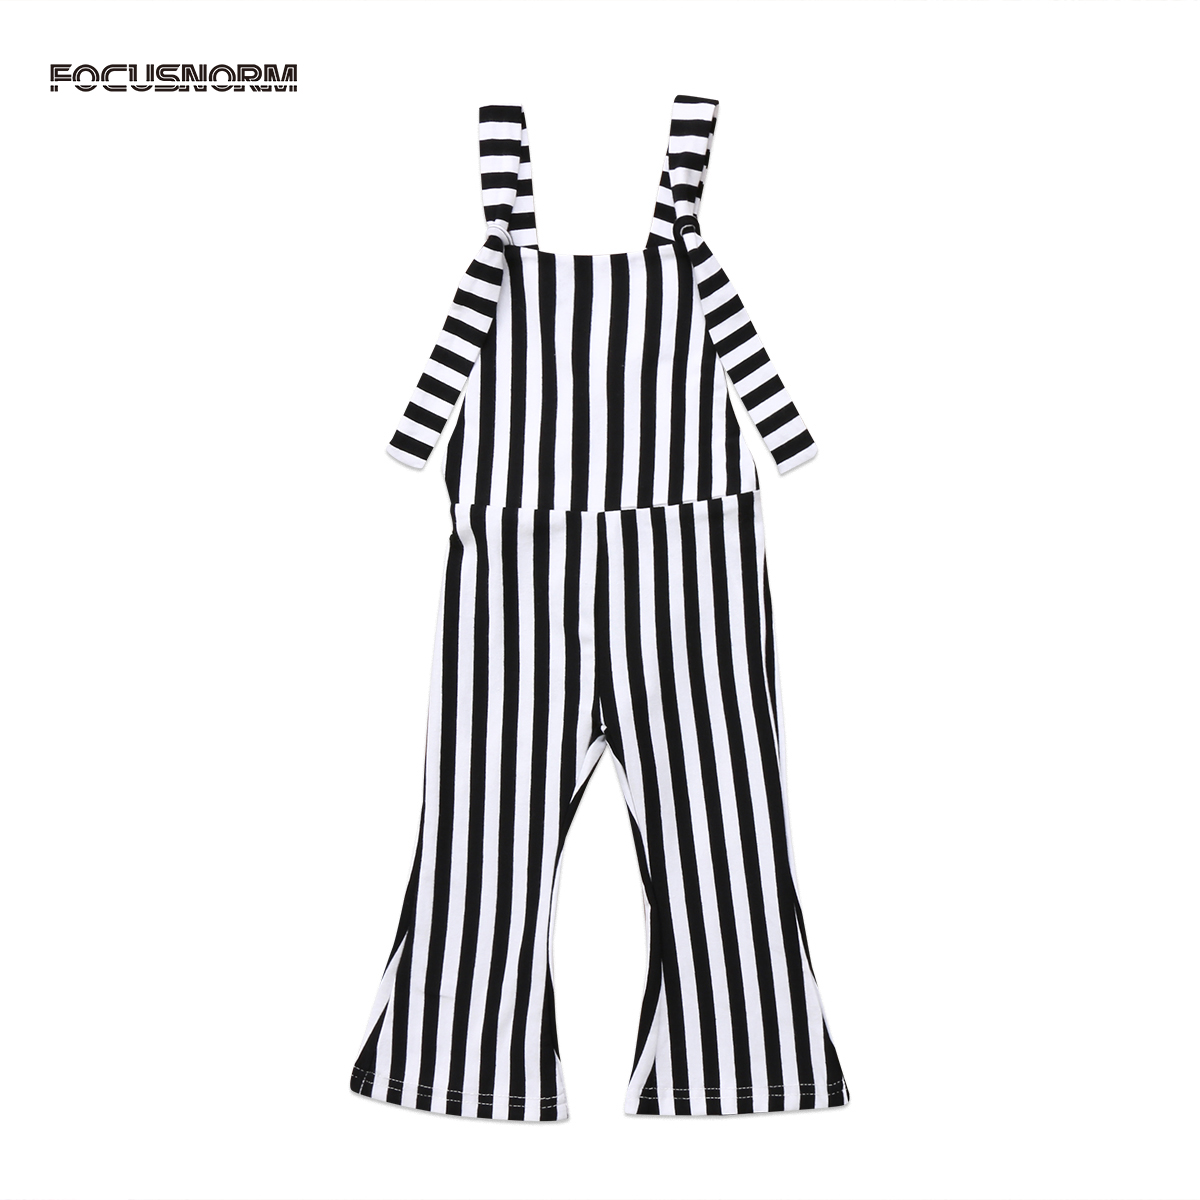 Toddler Kids Baby Girl Vertical Striped Brace Flare Pants Overalls Jumper Sleeveless Back Cross Romper Outfit For Children 1-5Y